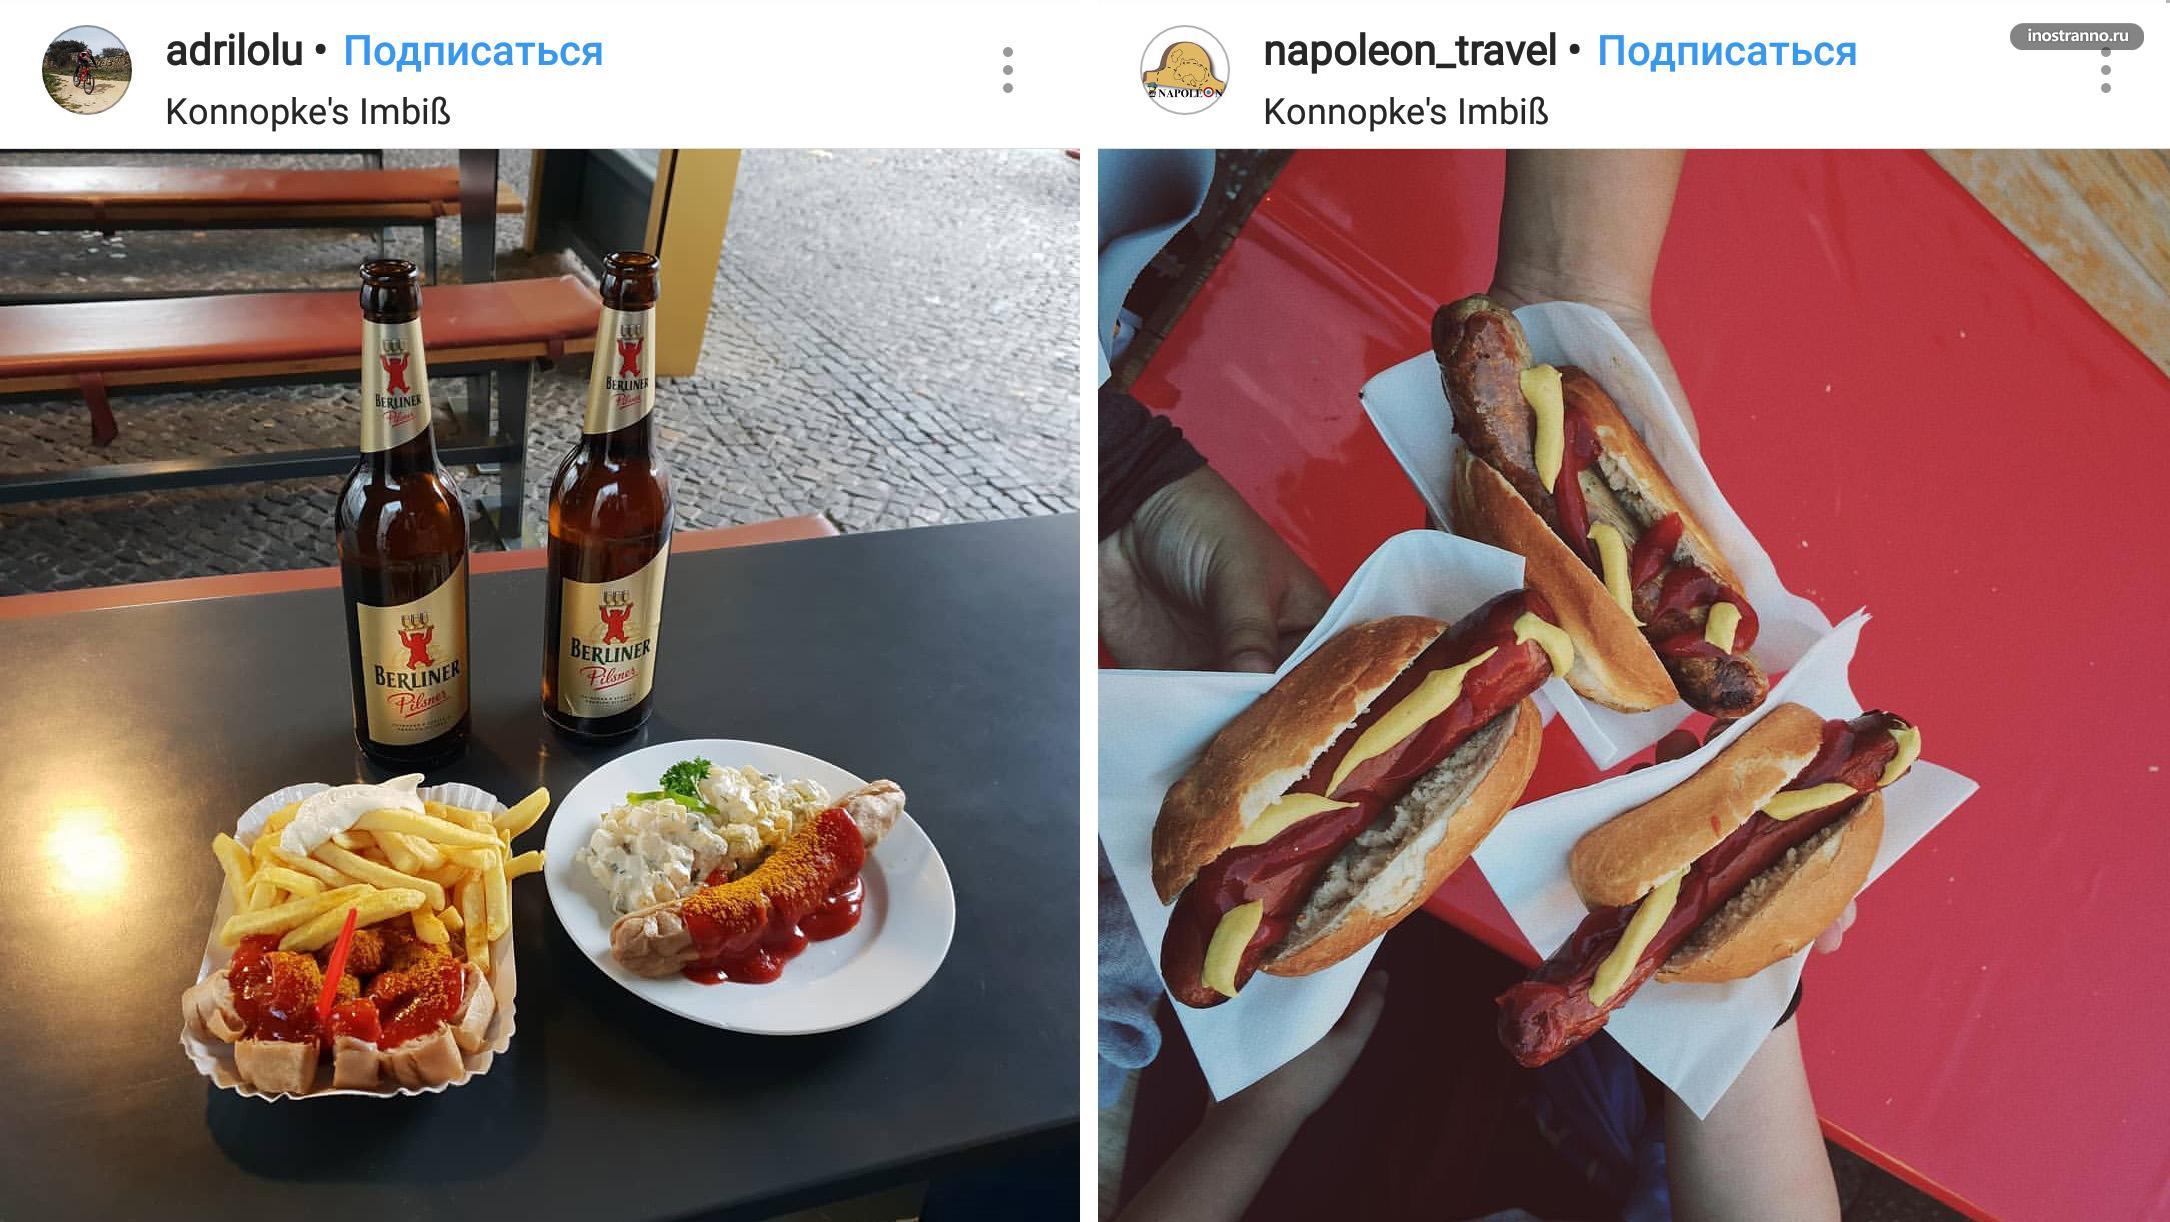 Konnopke's Imbiss самая вкусная уличная еда в Берлине